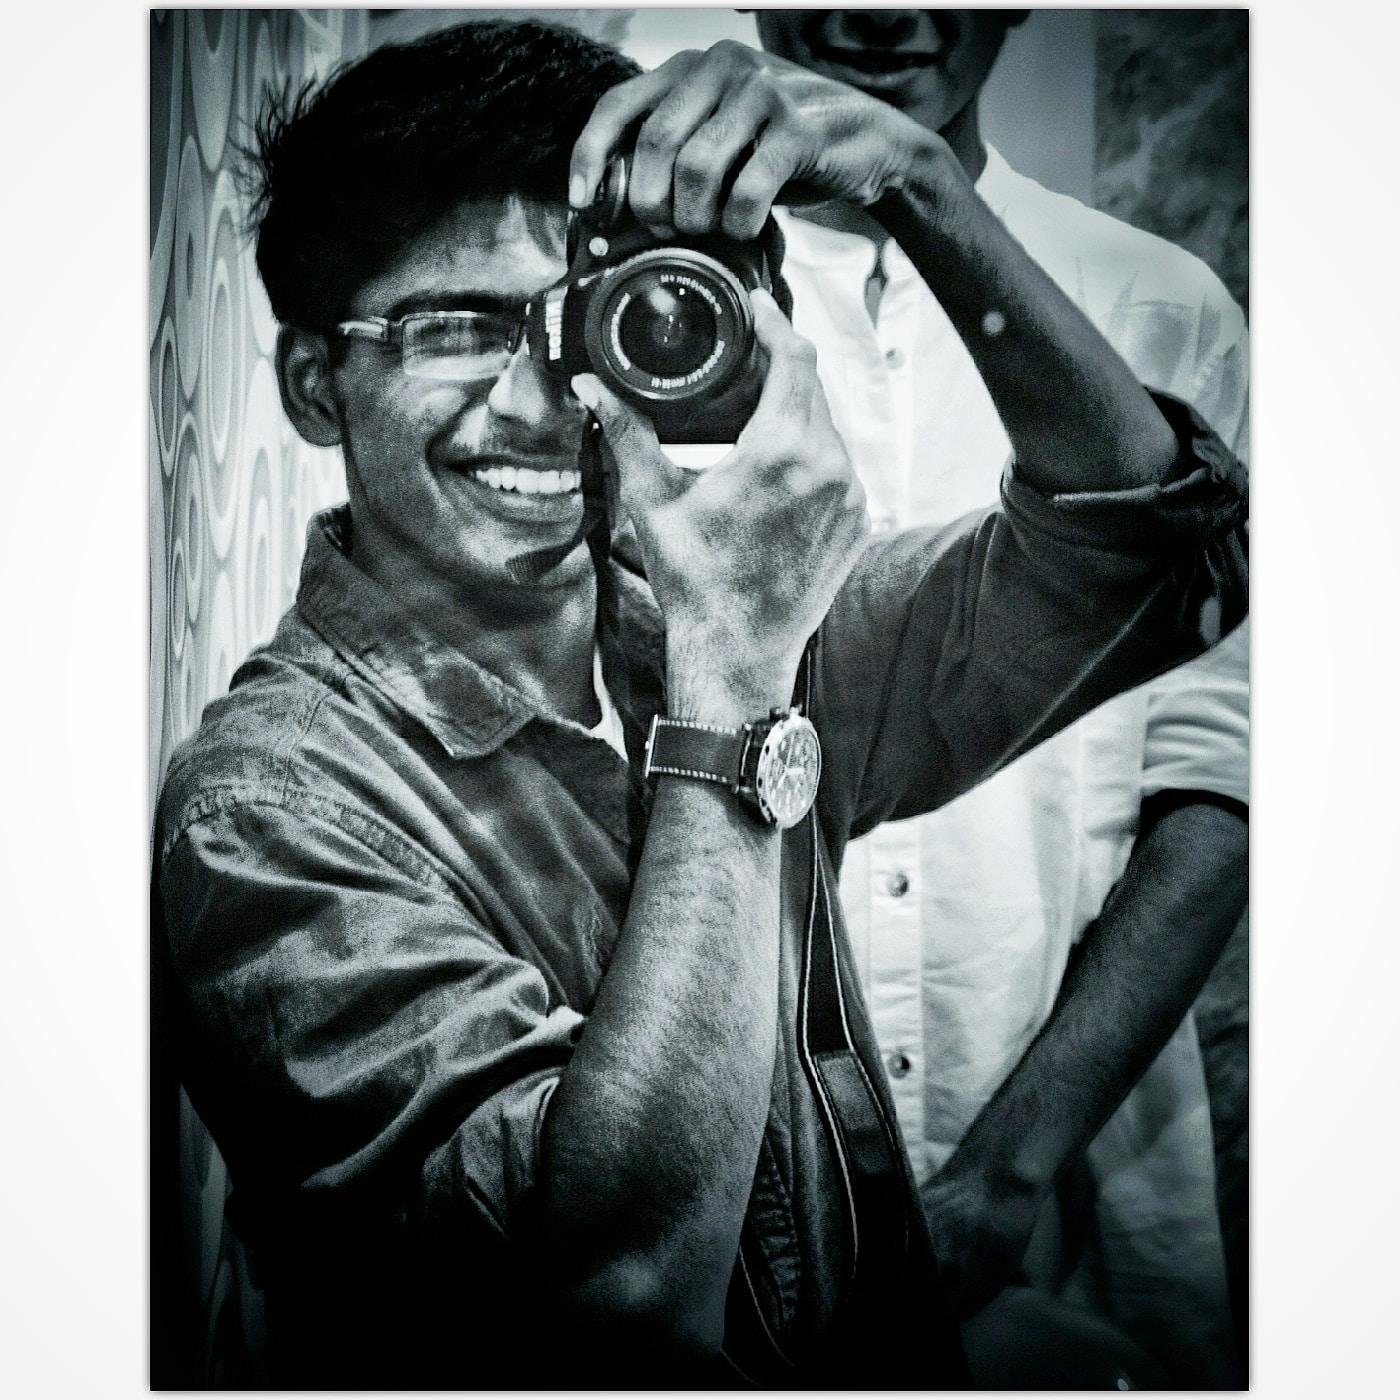 Go to Pushkar Deshpande's profile